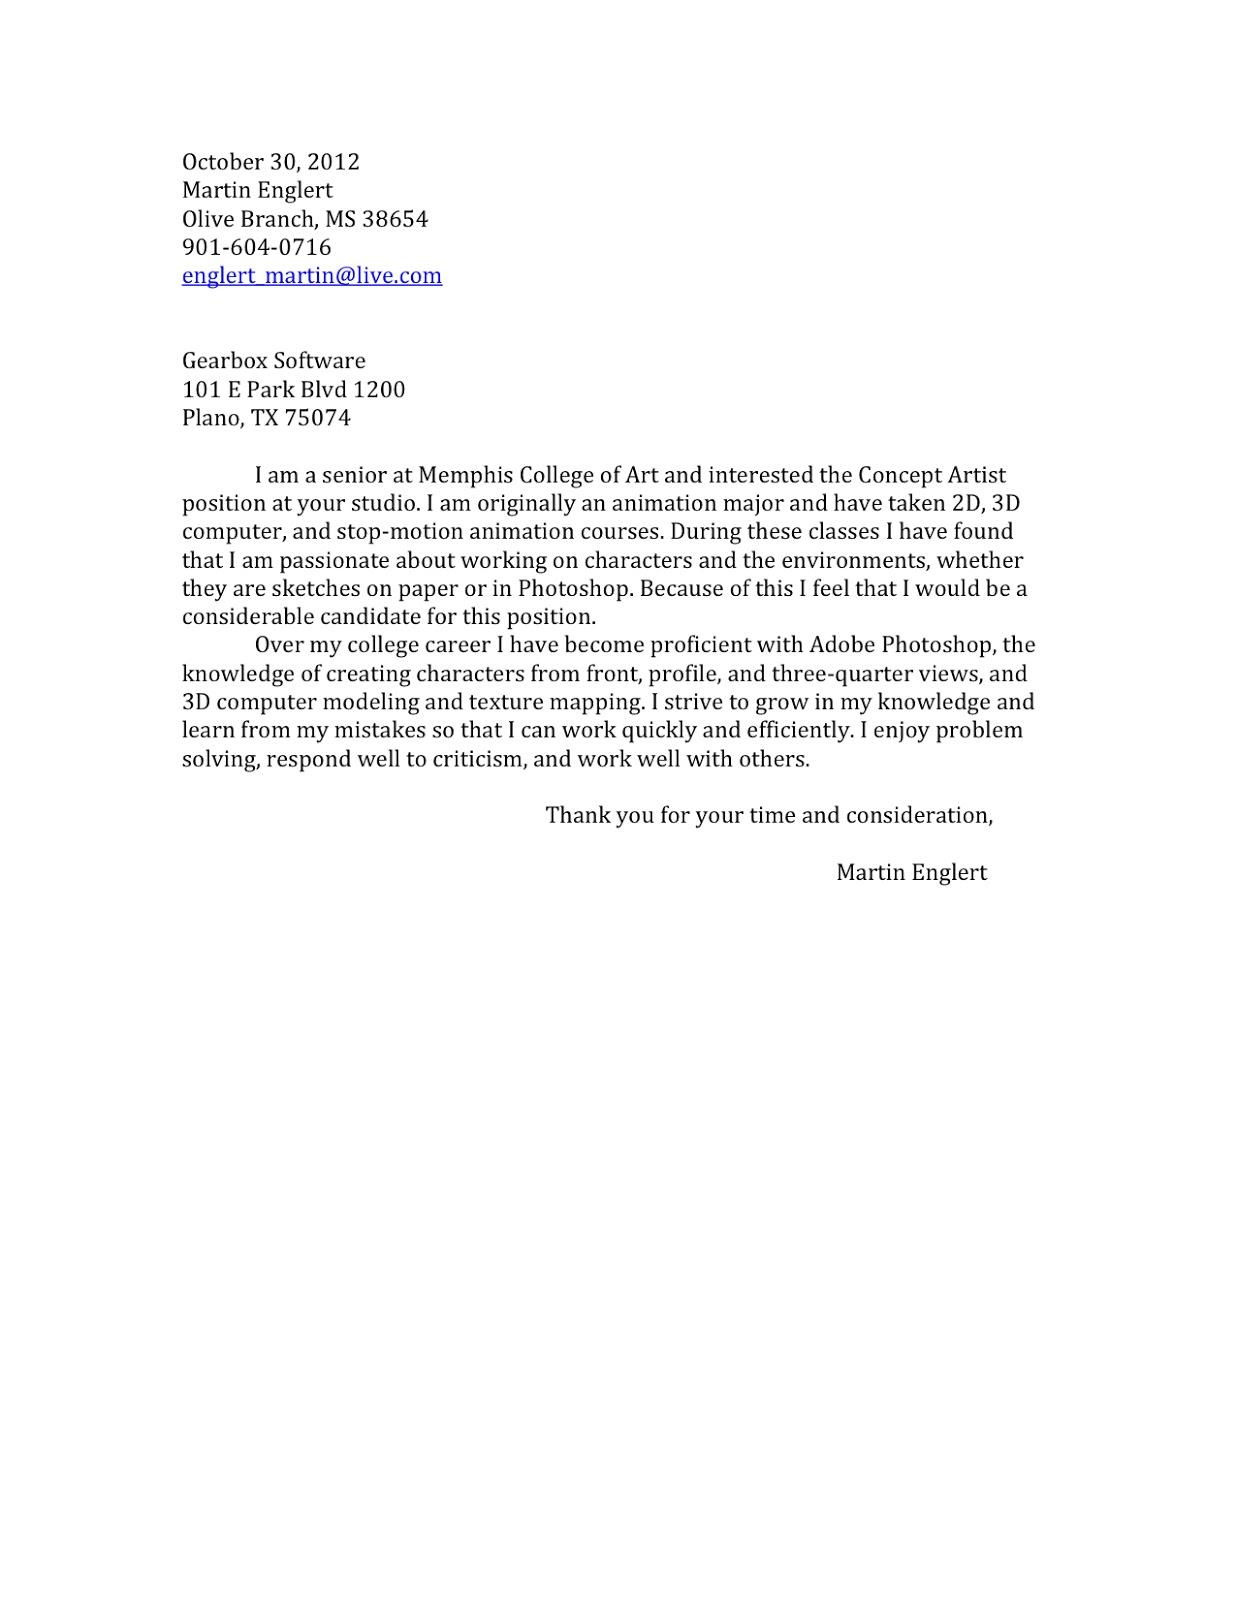 cover letter for ob gyn position - sample cover letter for gamestop